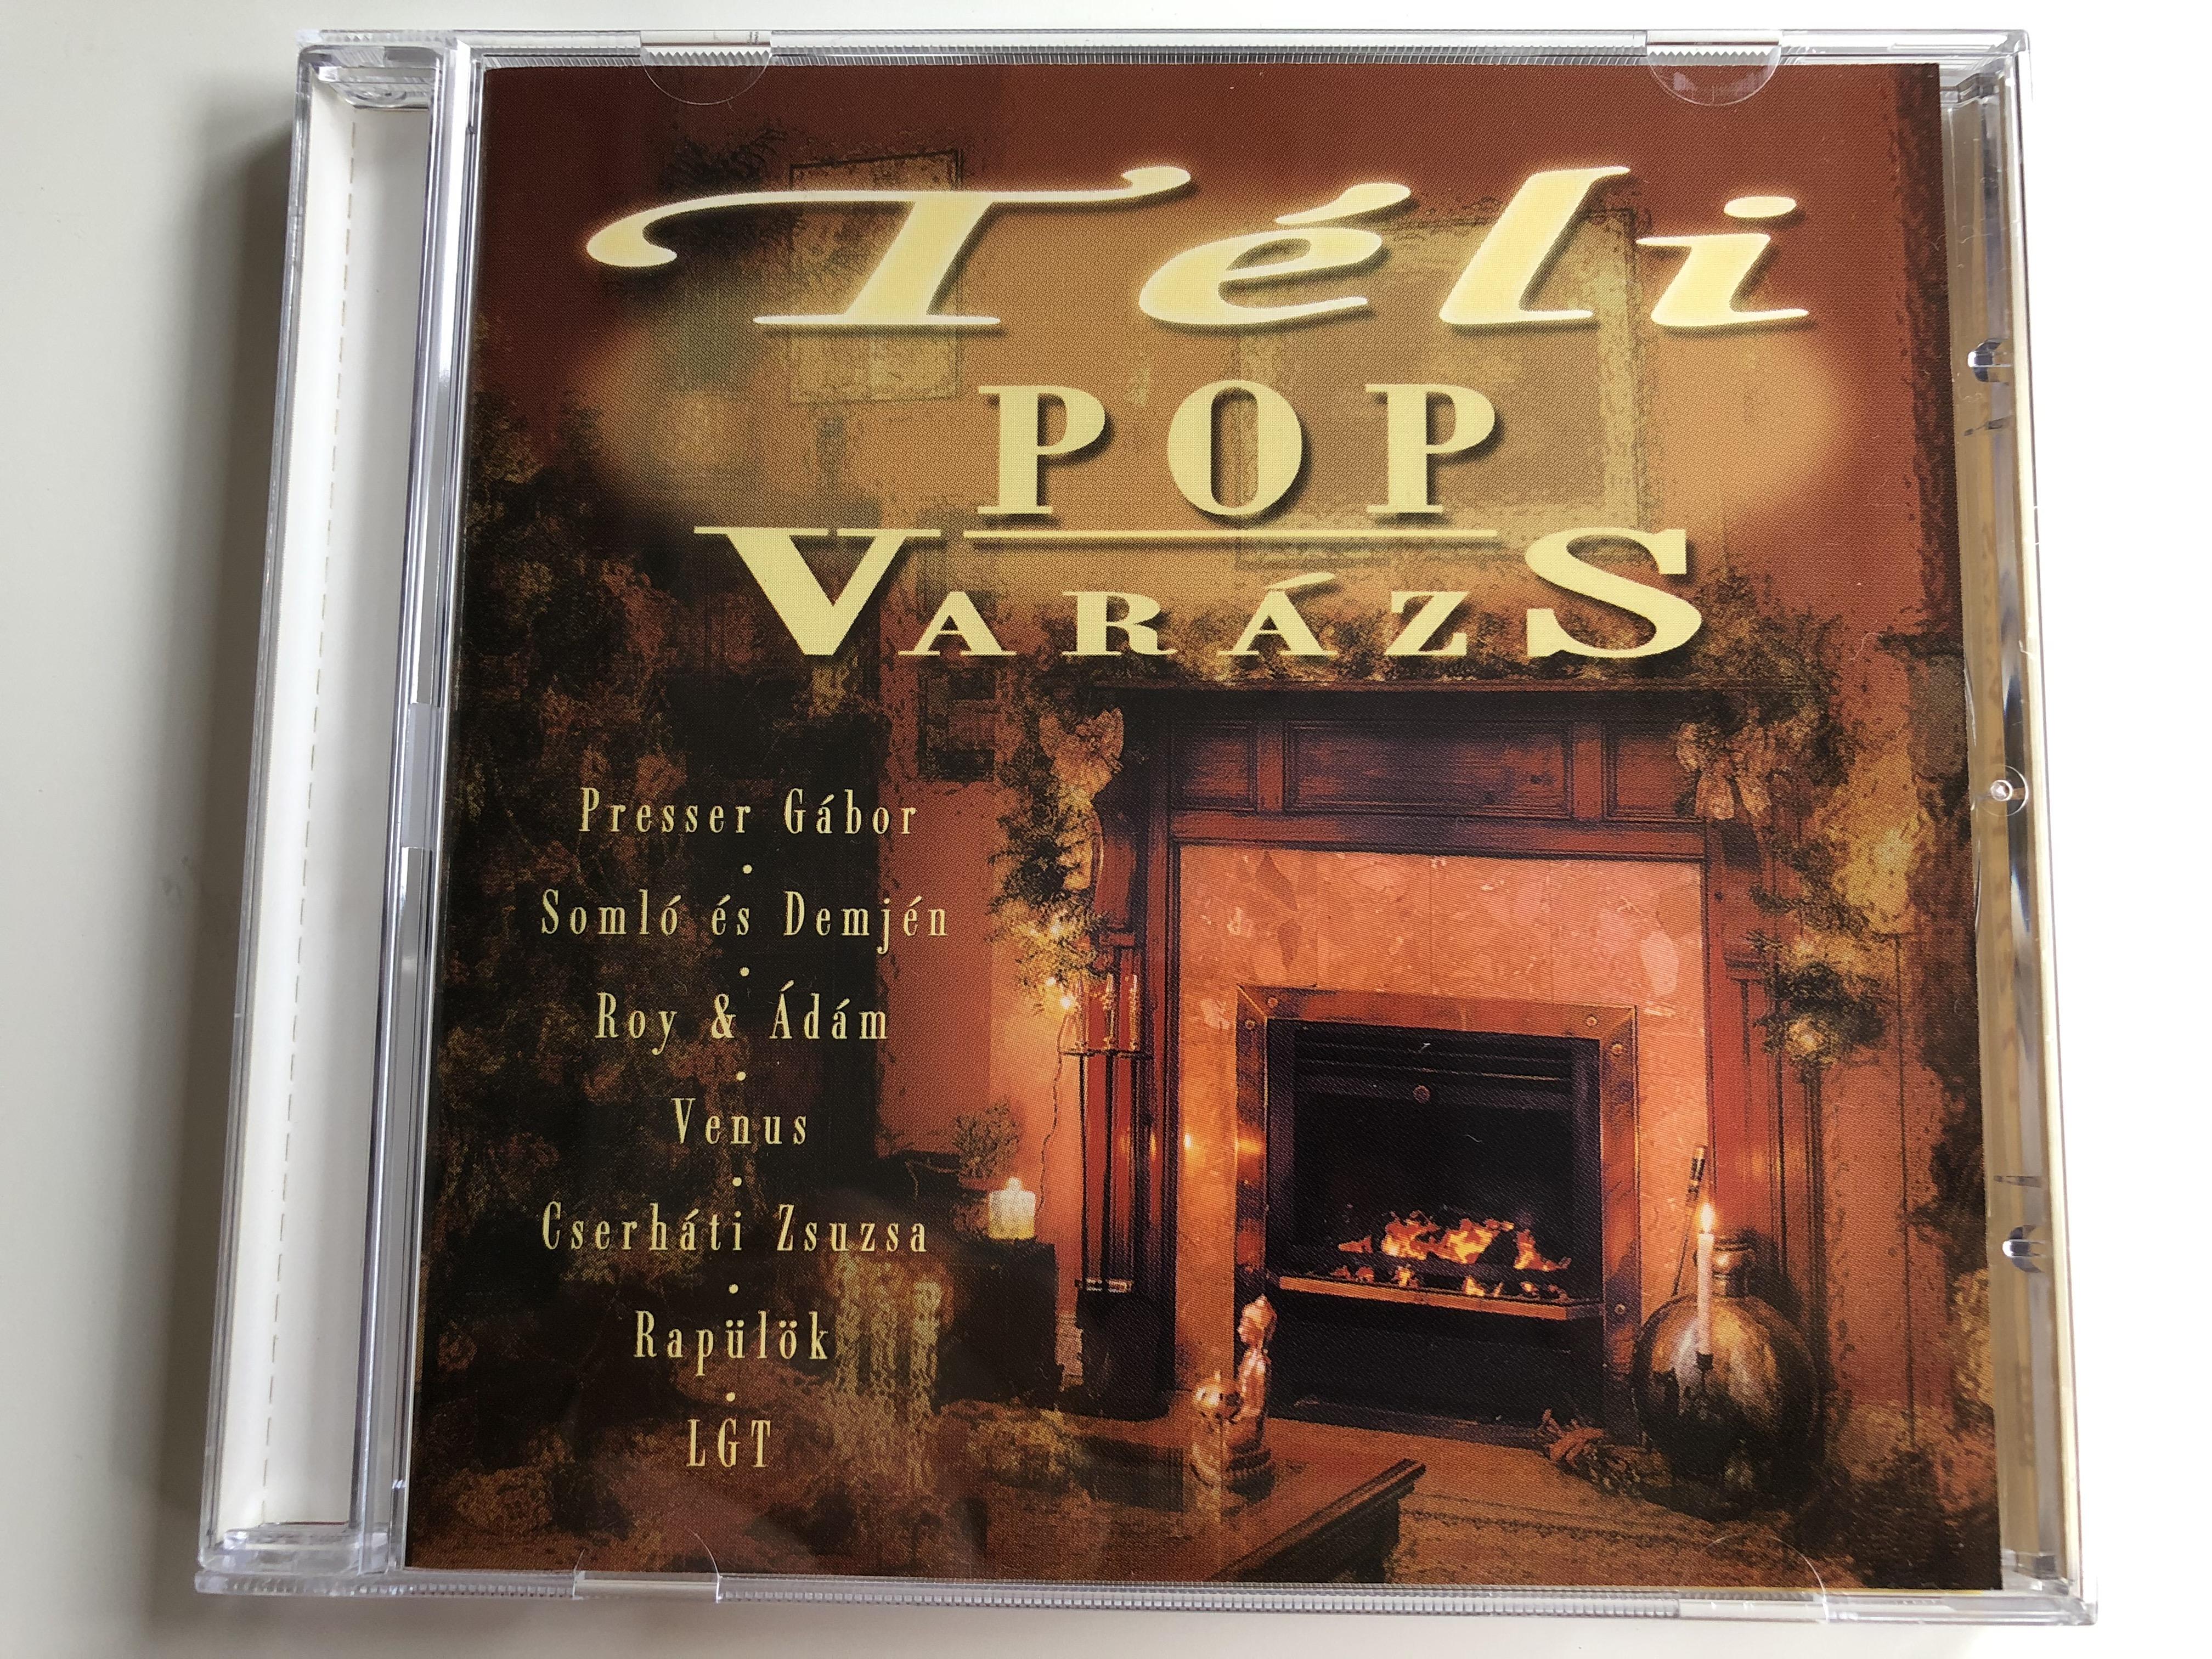 teli-pop-varazs-presser-gabor-somlo-es-demjen-roy-adam-venus-cserhati-zsuzsa-rapulok-lgt-bmg-ariola-hungary-audio-cd-2000-74321-823532-1-.jpg